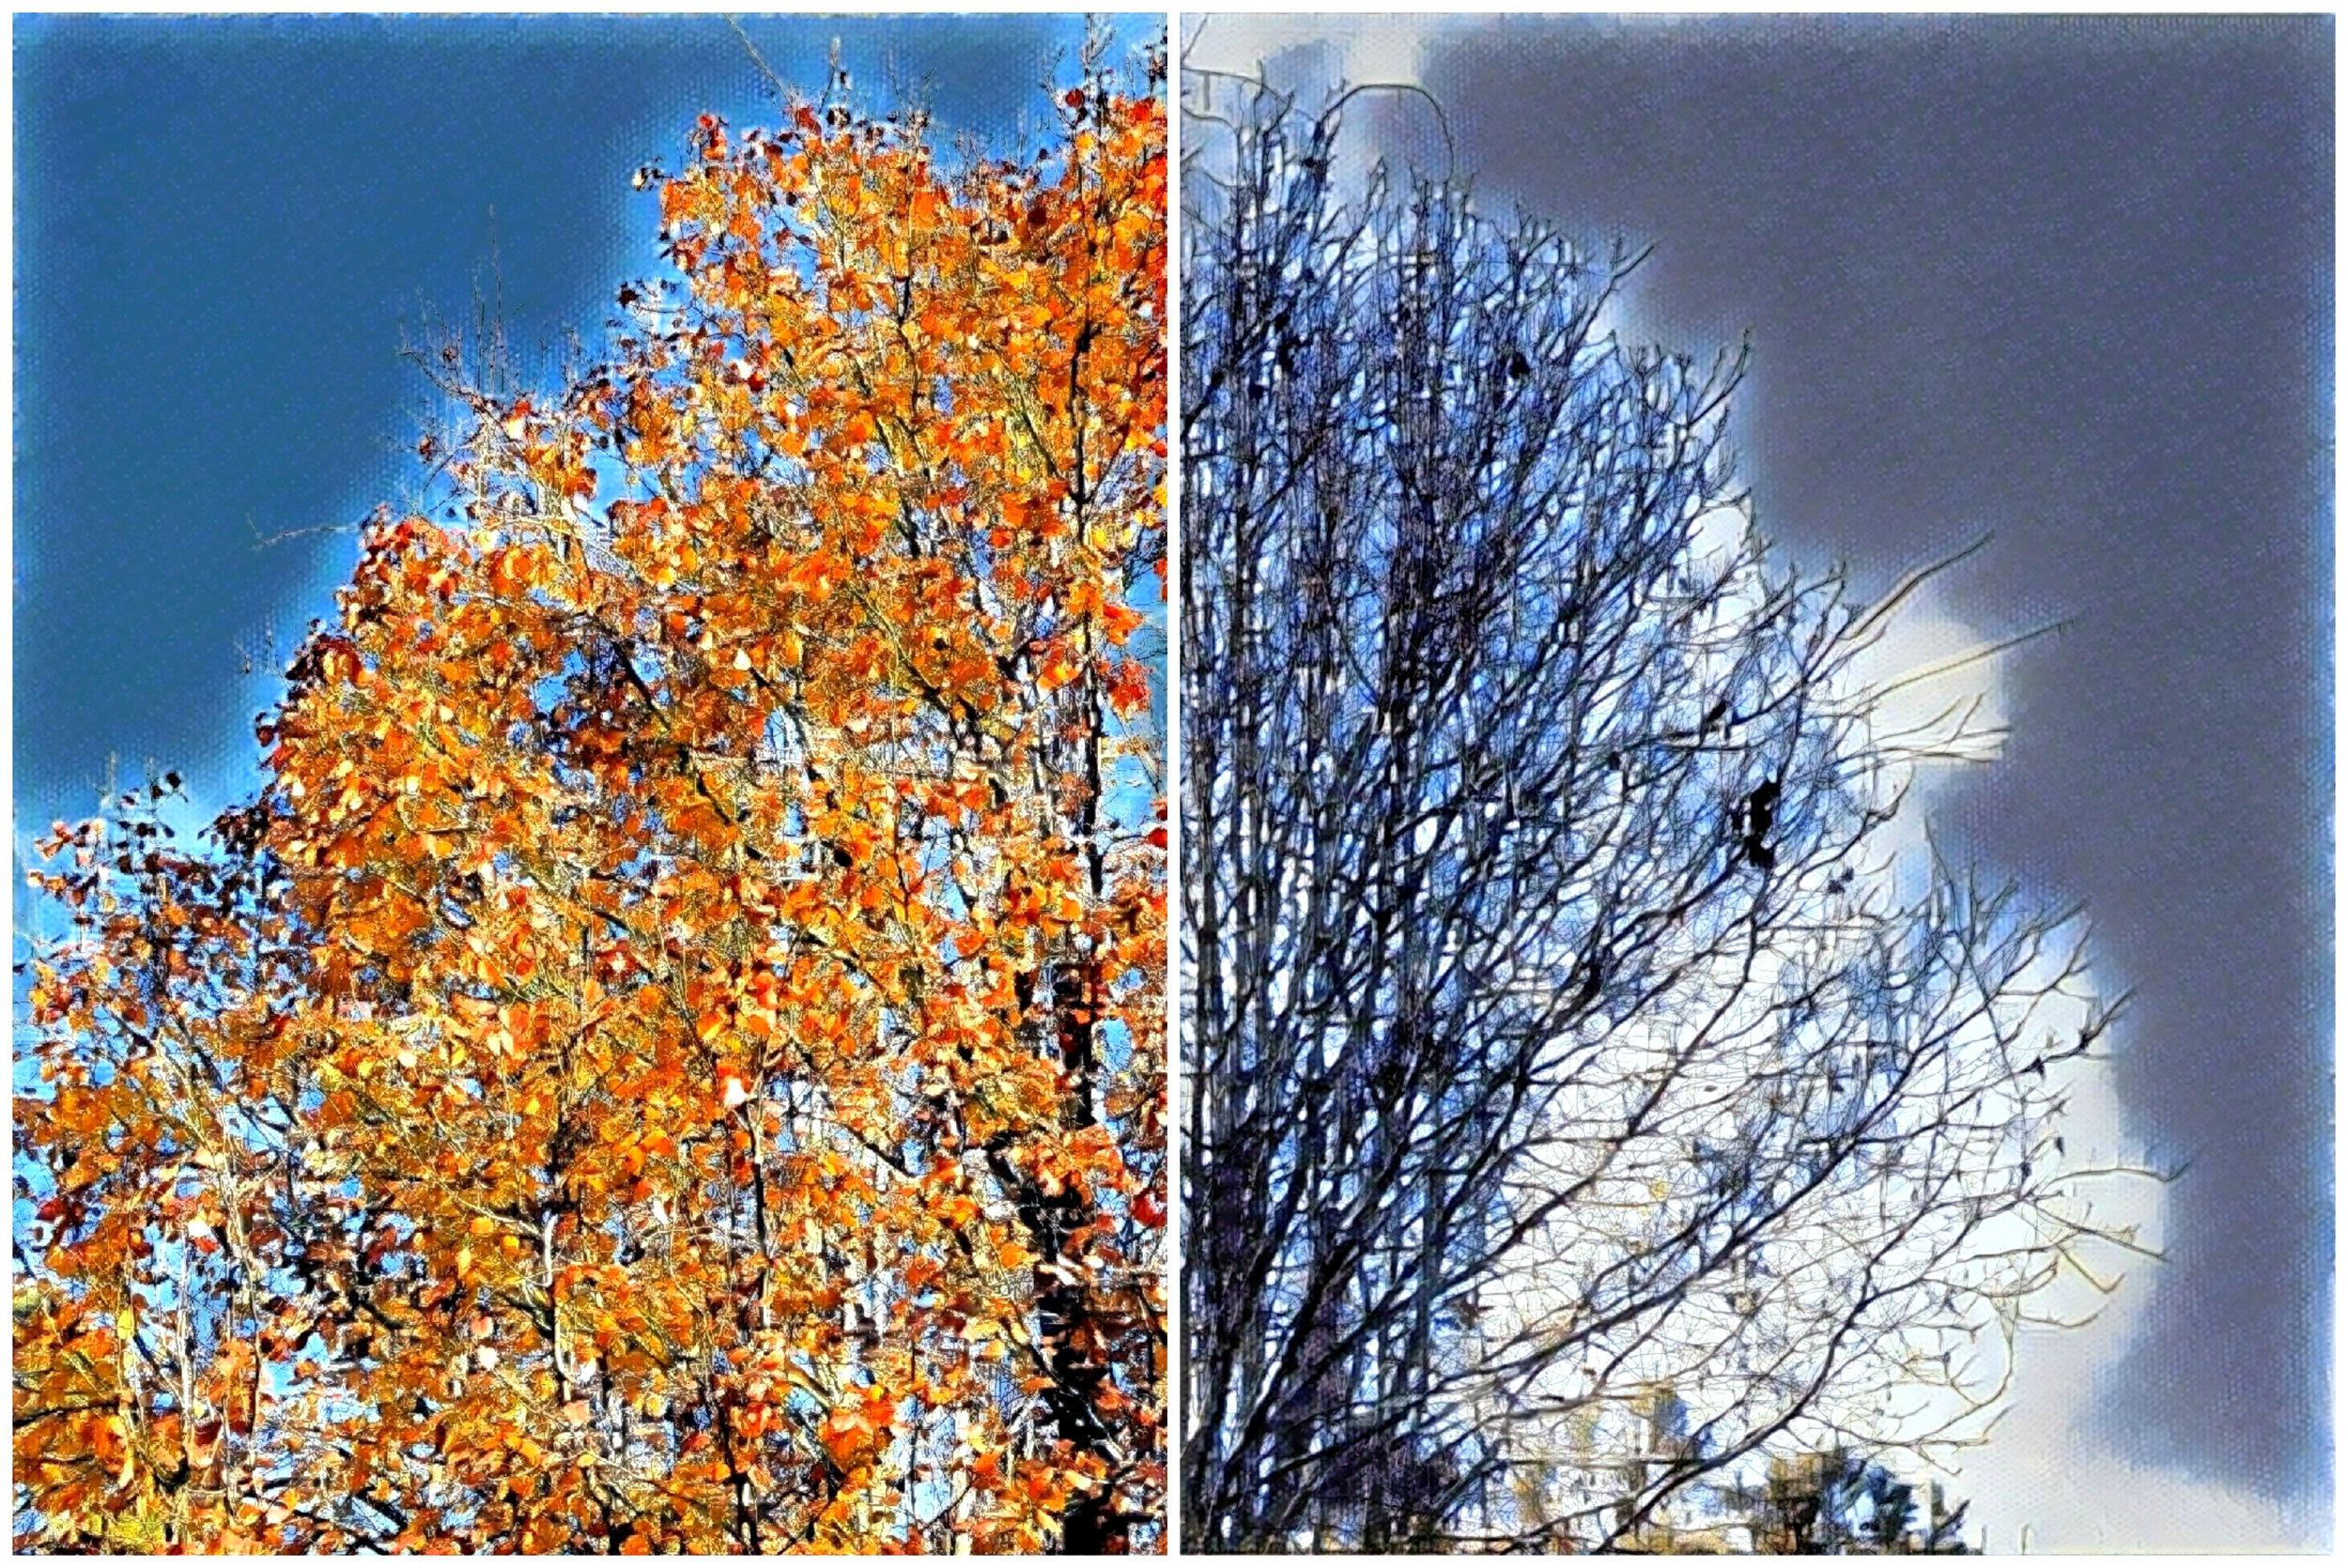 autumn-winter bradford pear.jpg